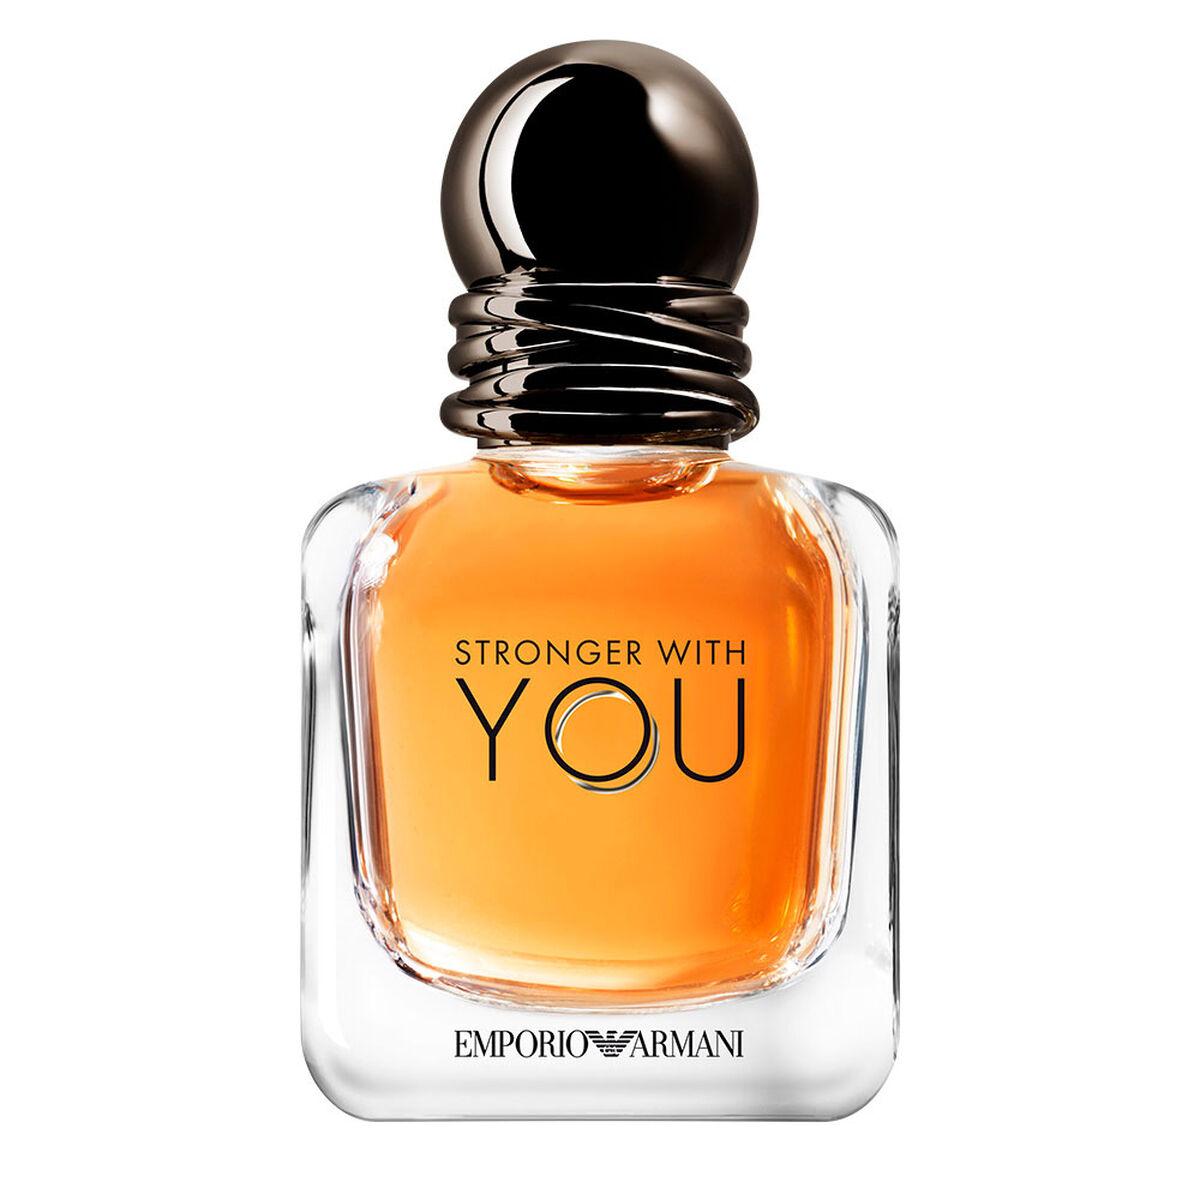 Perfume Giorgio Armani Stronger With You 30 ml